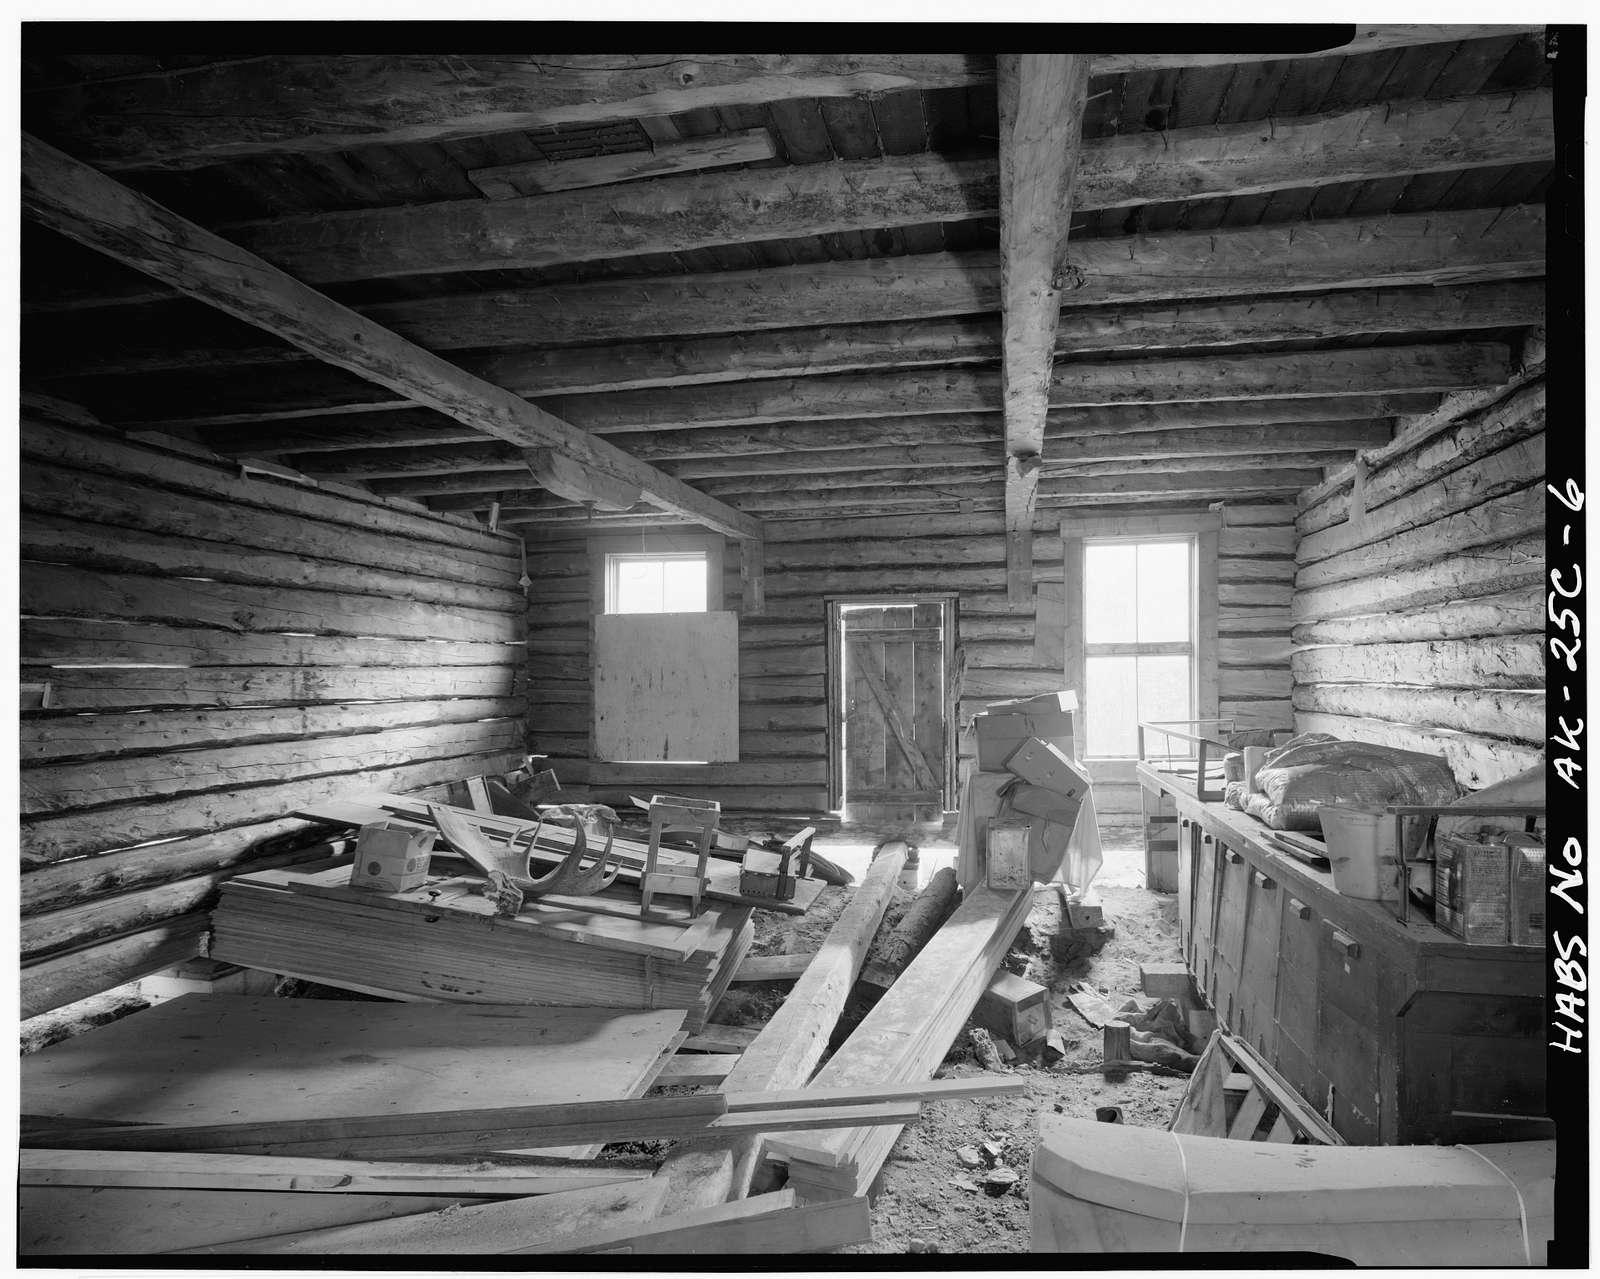 Northern Commercial Company Store, Koyukuk River at Wiseman Creek, Bettles Vicinity, Wiseman, Yukon-Koyukuk Census Area, AK